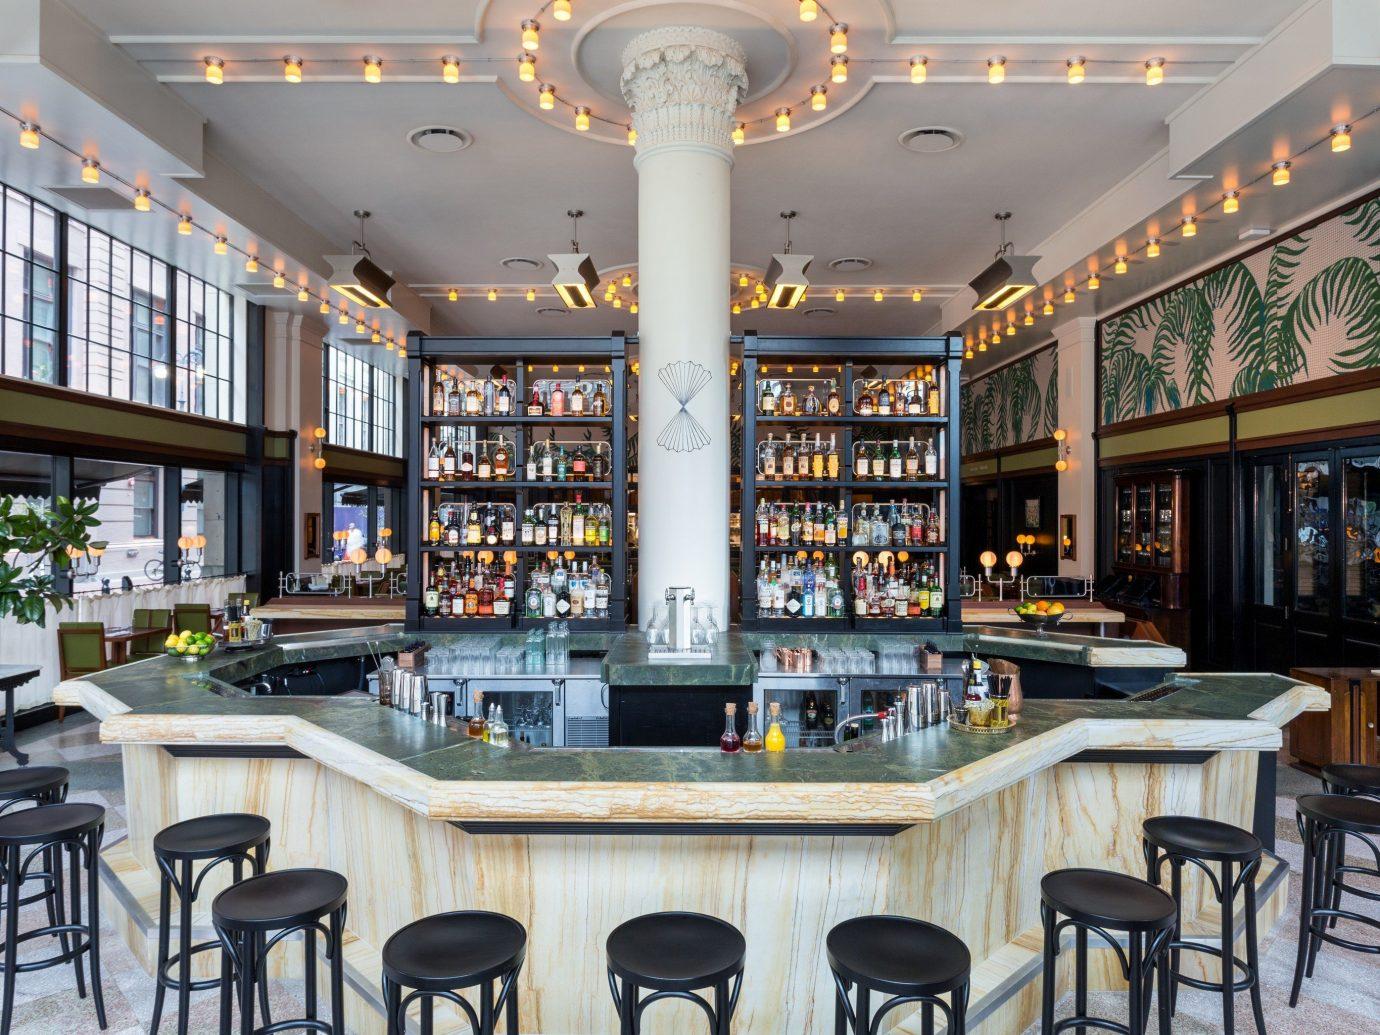 Food + Drink Girls Getaways Hotels New Orleans Trip Ideas Weekend Getaways indoor chair property room estate restaurant interior design real estate Bar meal Design